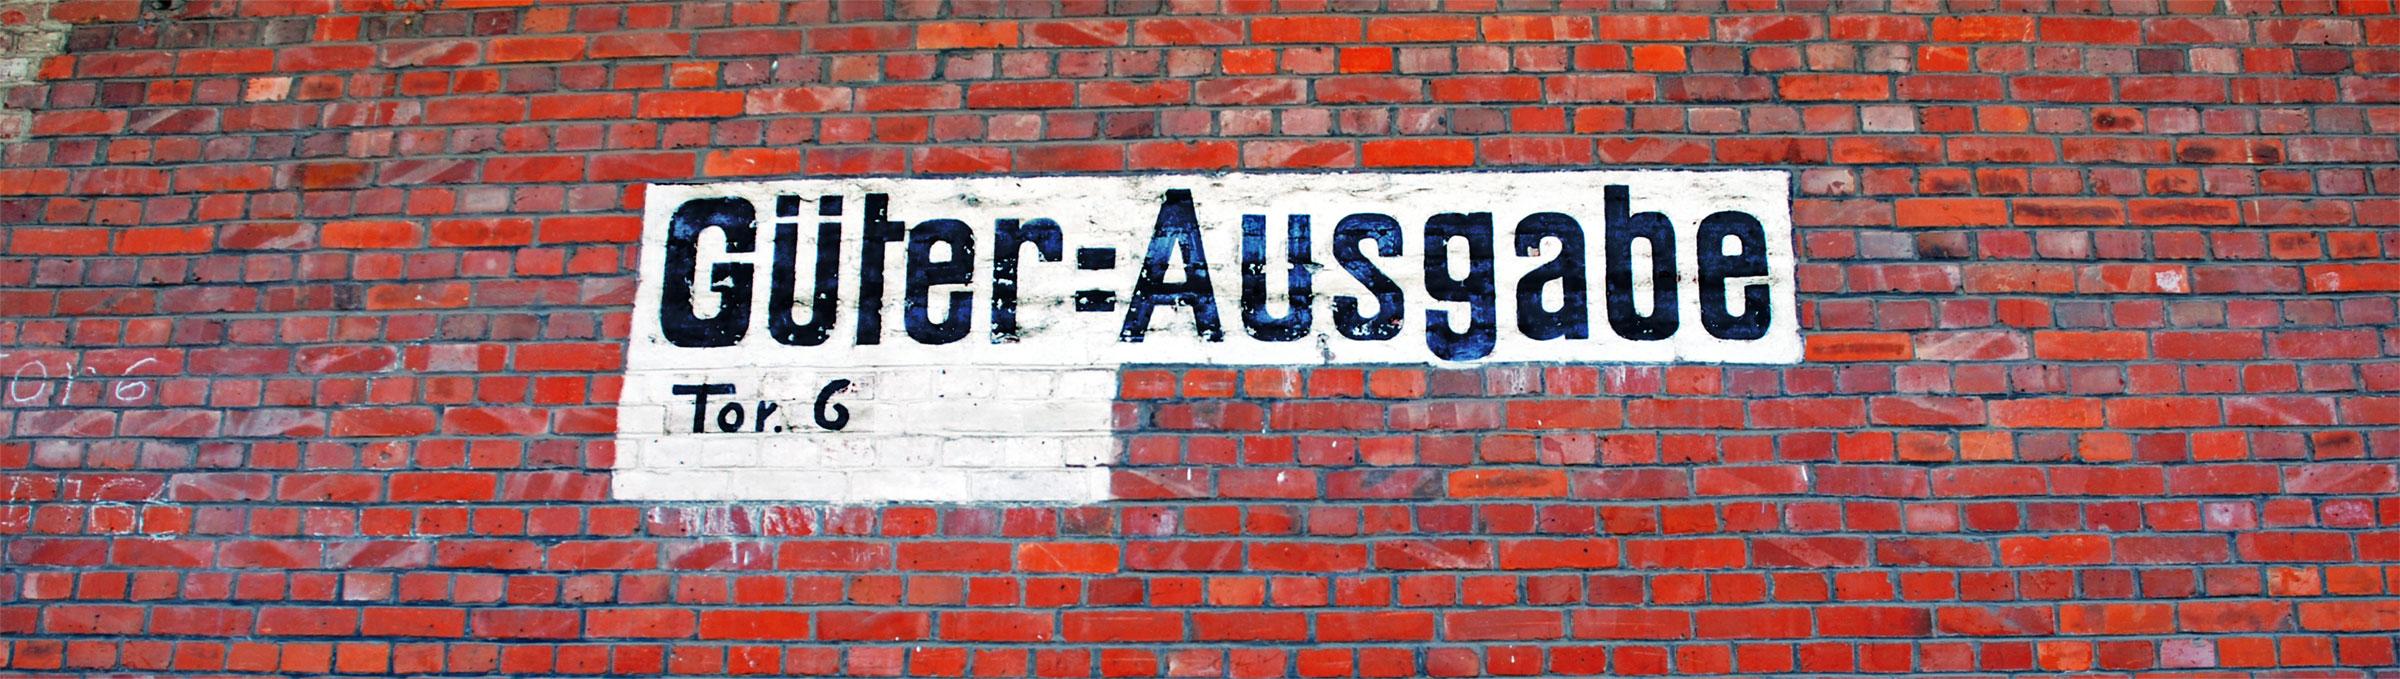 Gueterbahnhof_11